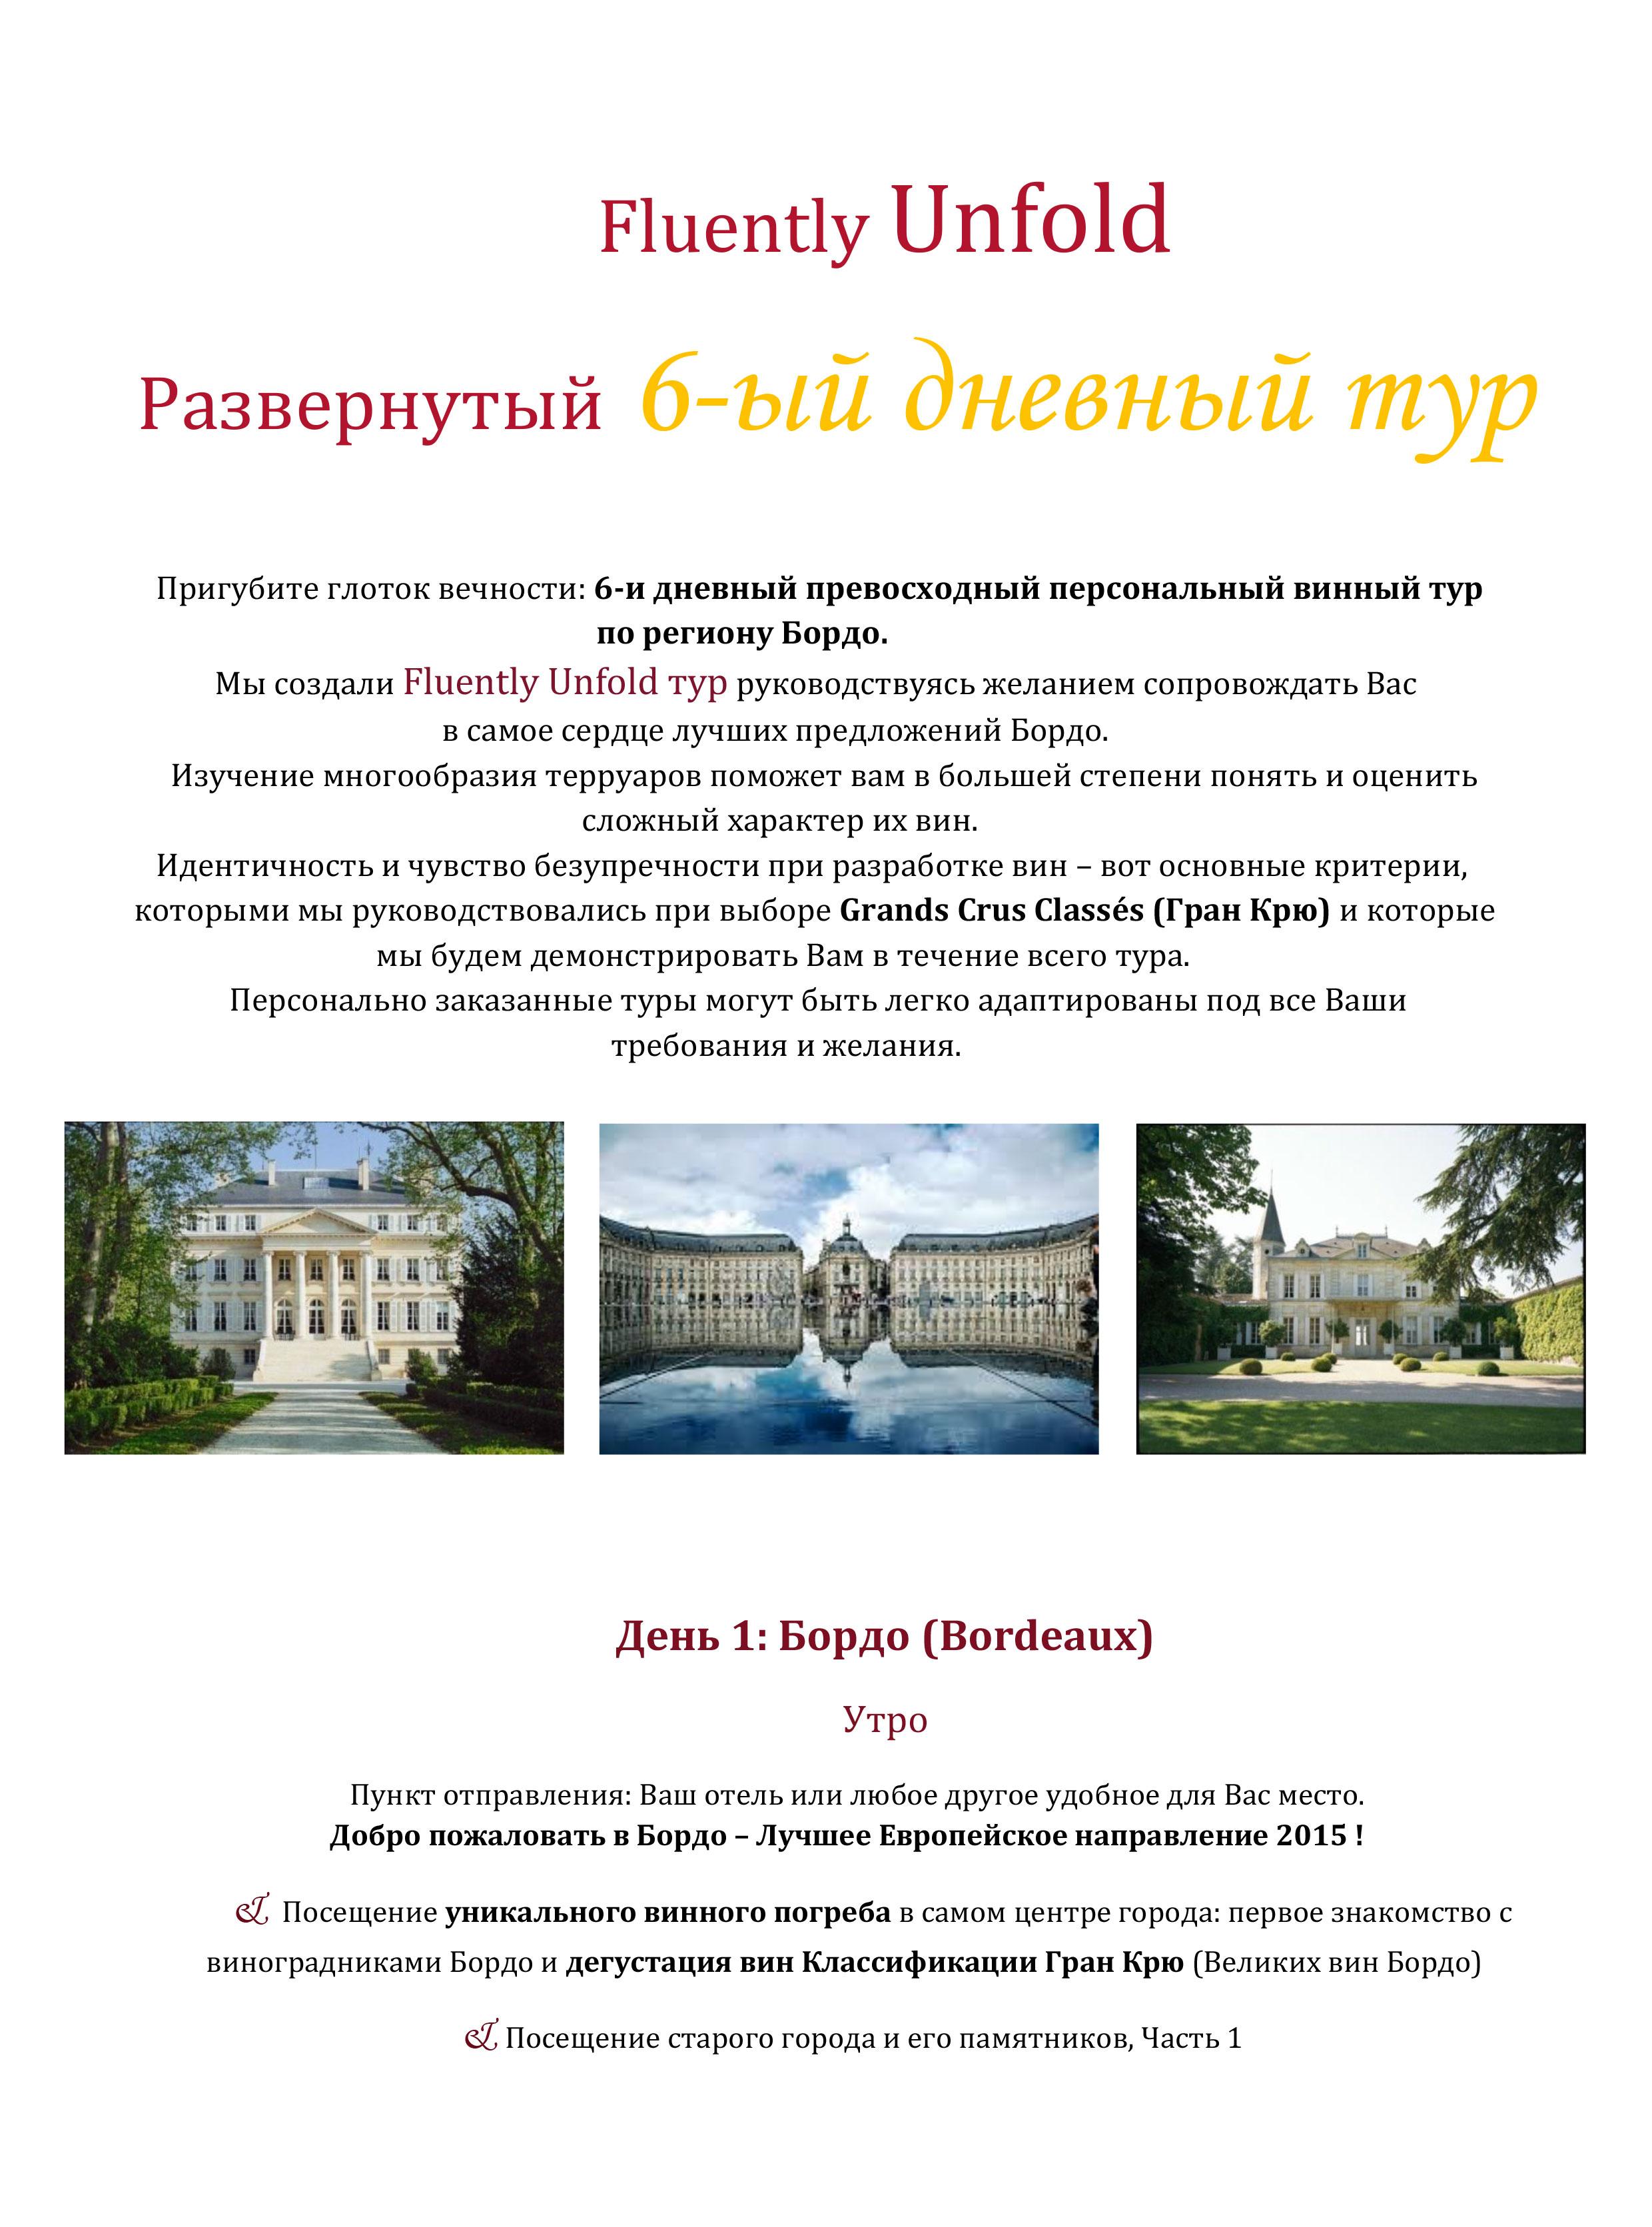 Fluently-Unfold_6jours_rus-1